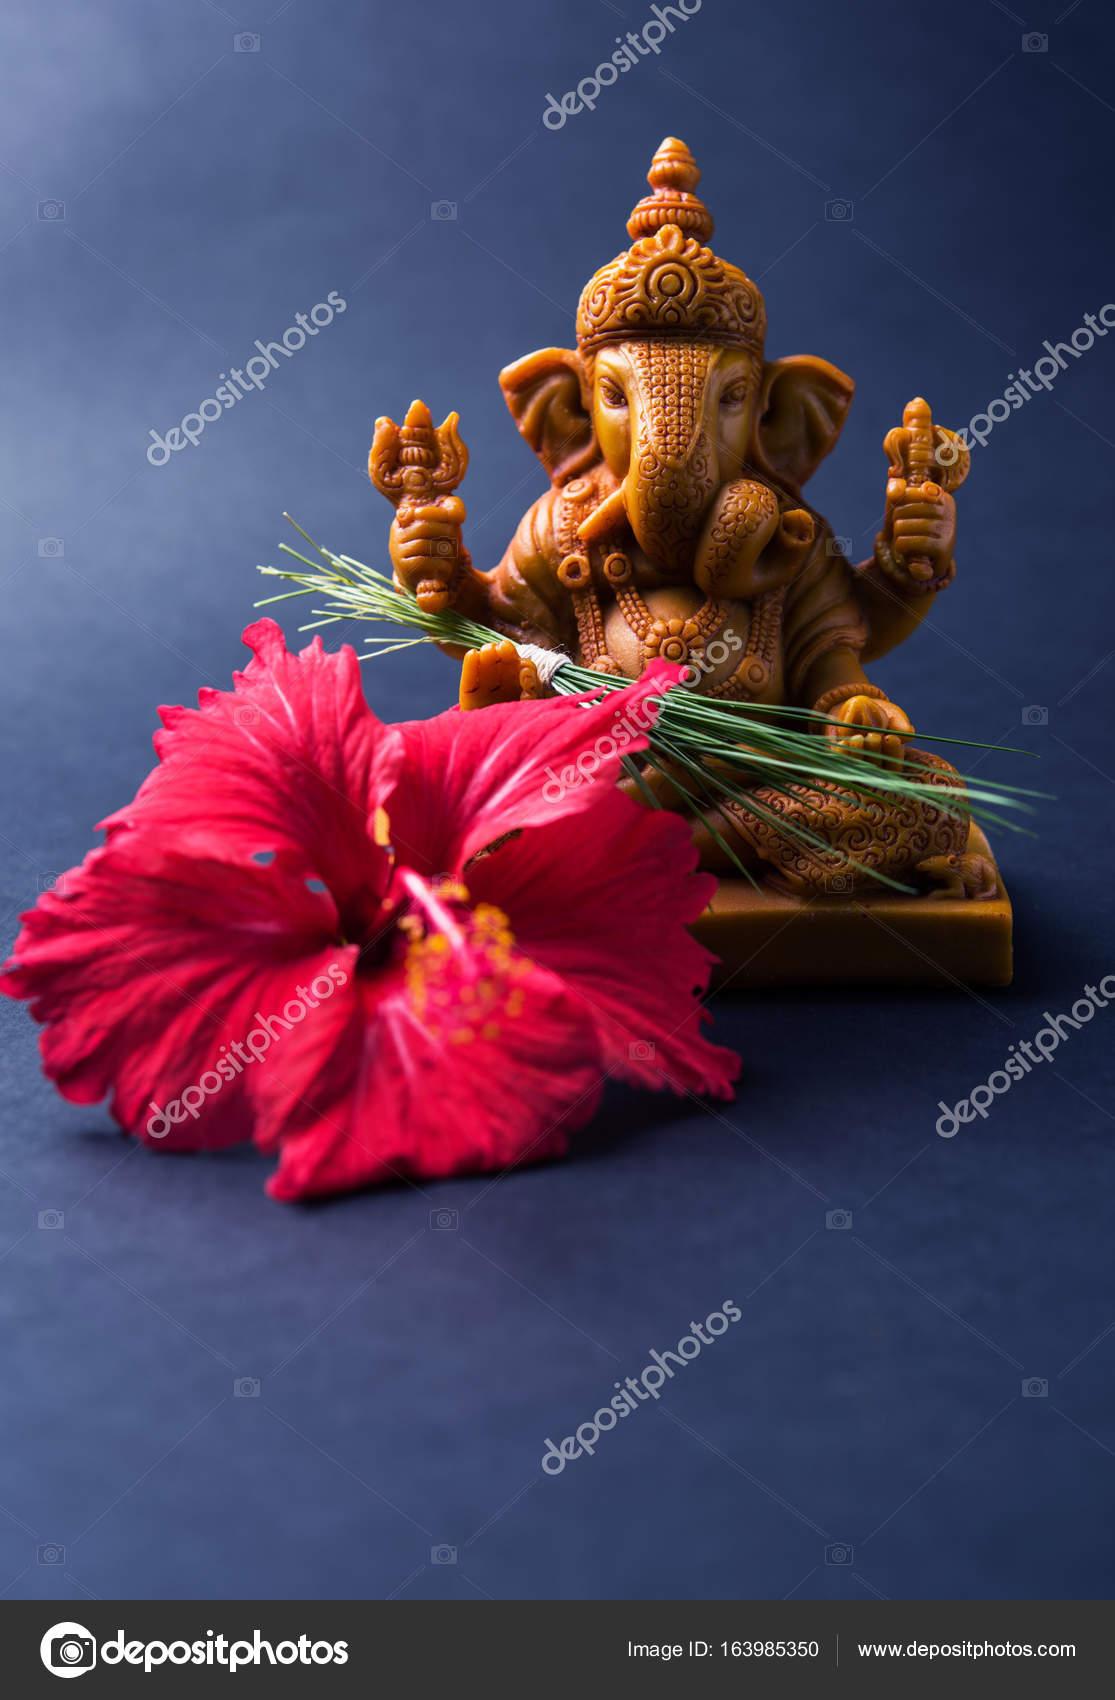 Ganesh 3d Wallpaper Full Size Happy Ganesh Chaturthi Greeting Card Showing Photograph Of Lord Ganesha Idol Pooja Or Puja Thali Bundi Laddu Modak Durva And Hibiscus Or Jasvand Flower Stock Photo C